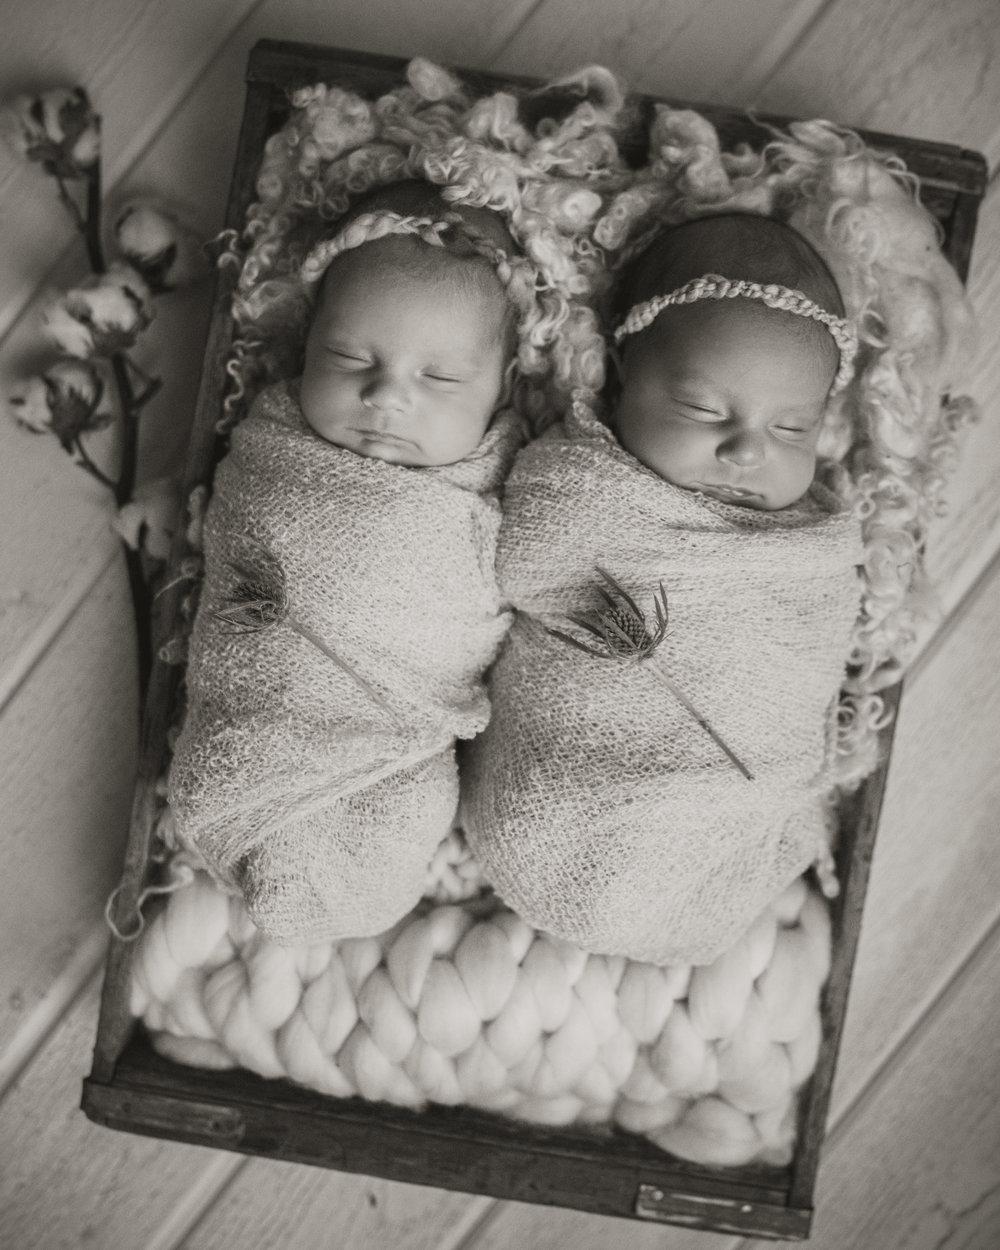 Laura Olson Photography - Nievelina - Newborns - Nova and Luna - December 2016-1689-2.jpg